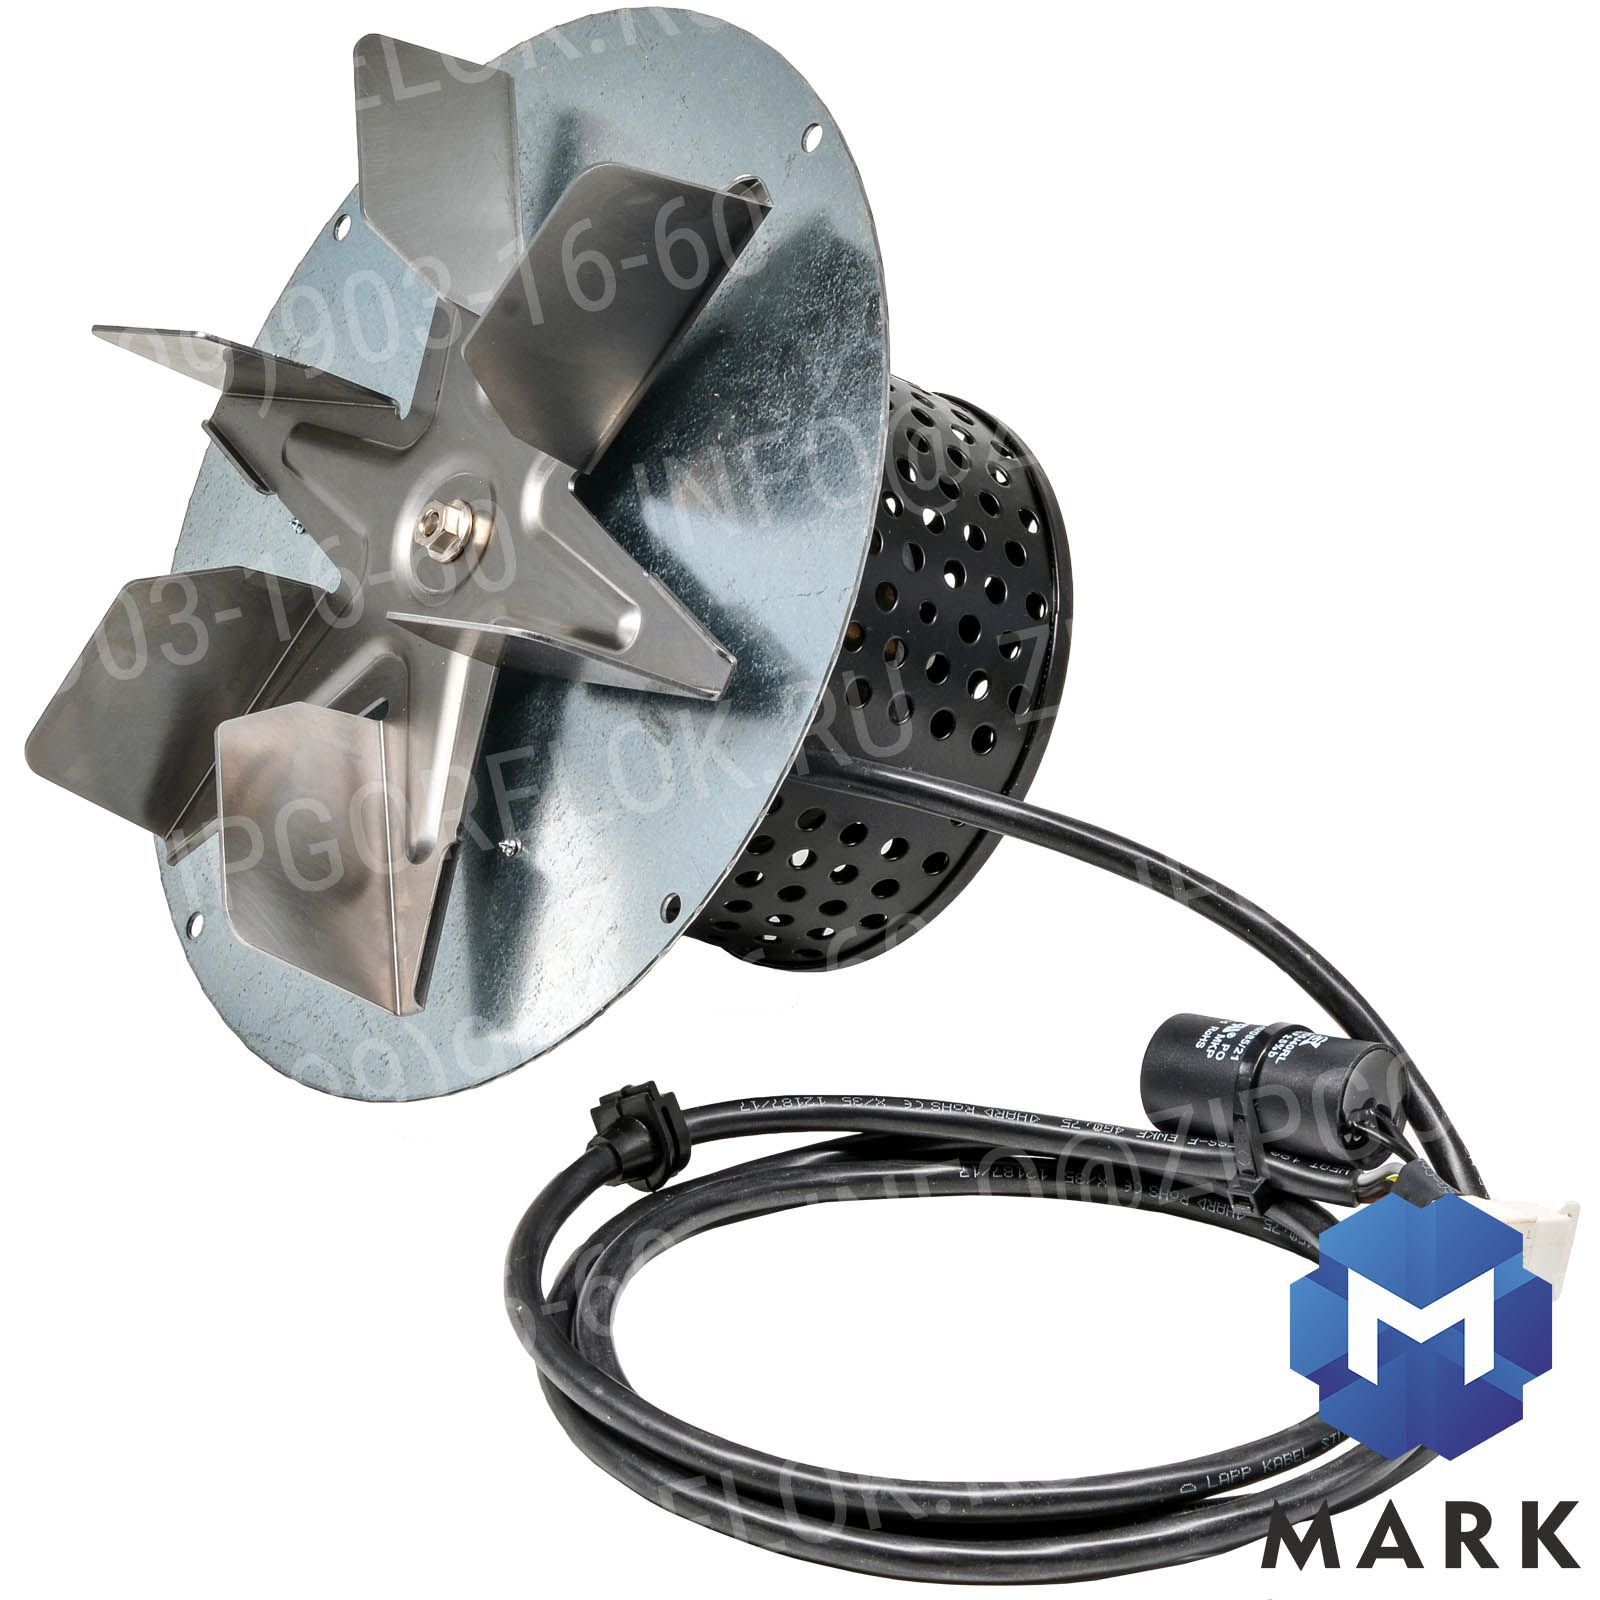 7832484 Центробежный вентилятор Ebmpapst R2E210-AB34-13, 120 Вт цена, купить